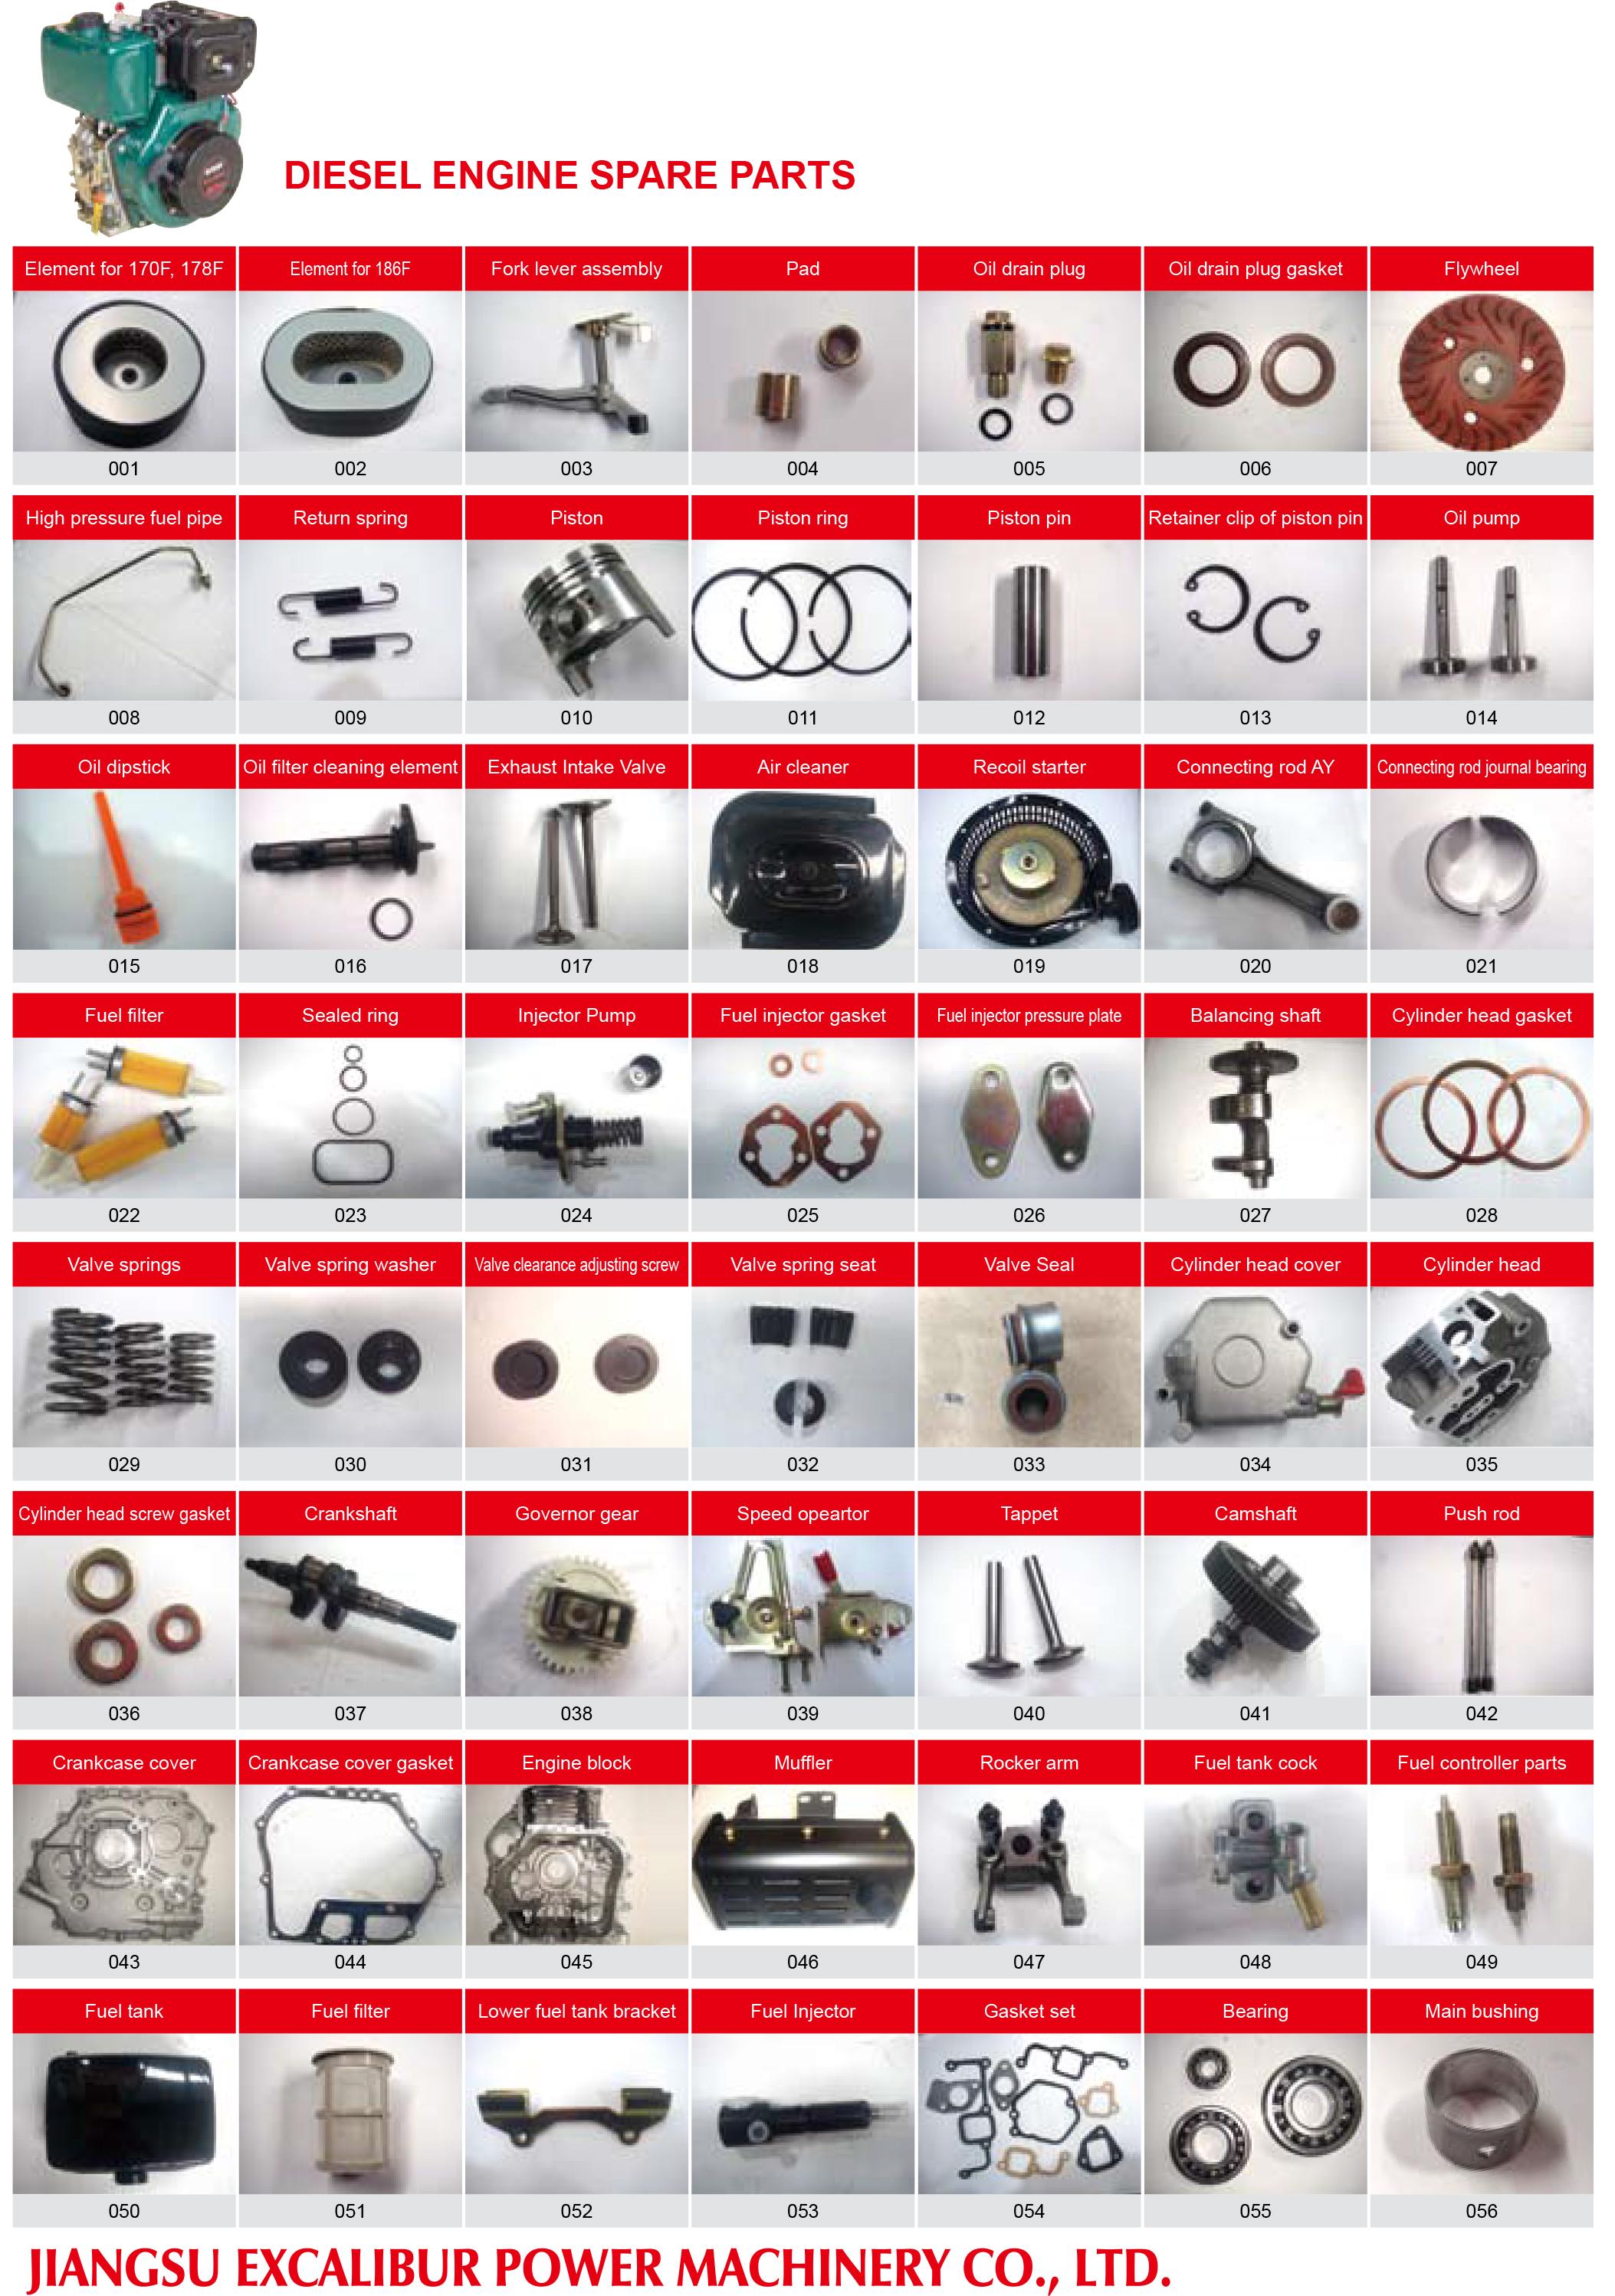 Diesel Engine Spare Parts_Jiangsu Excalibur